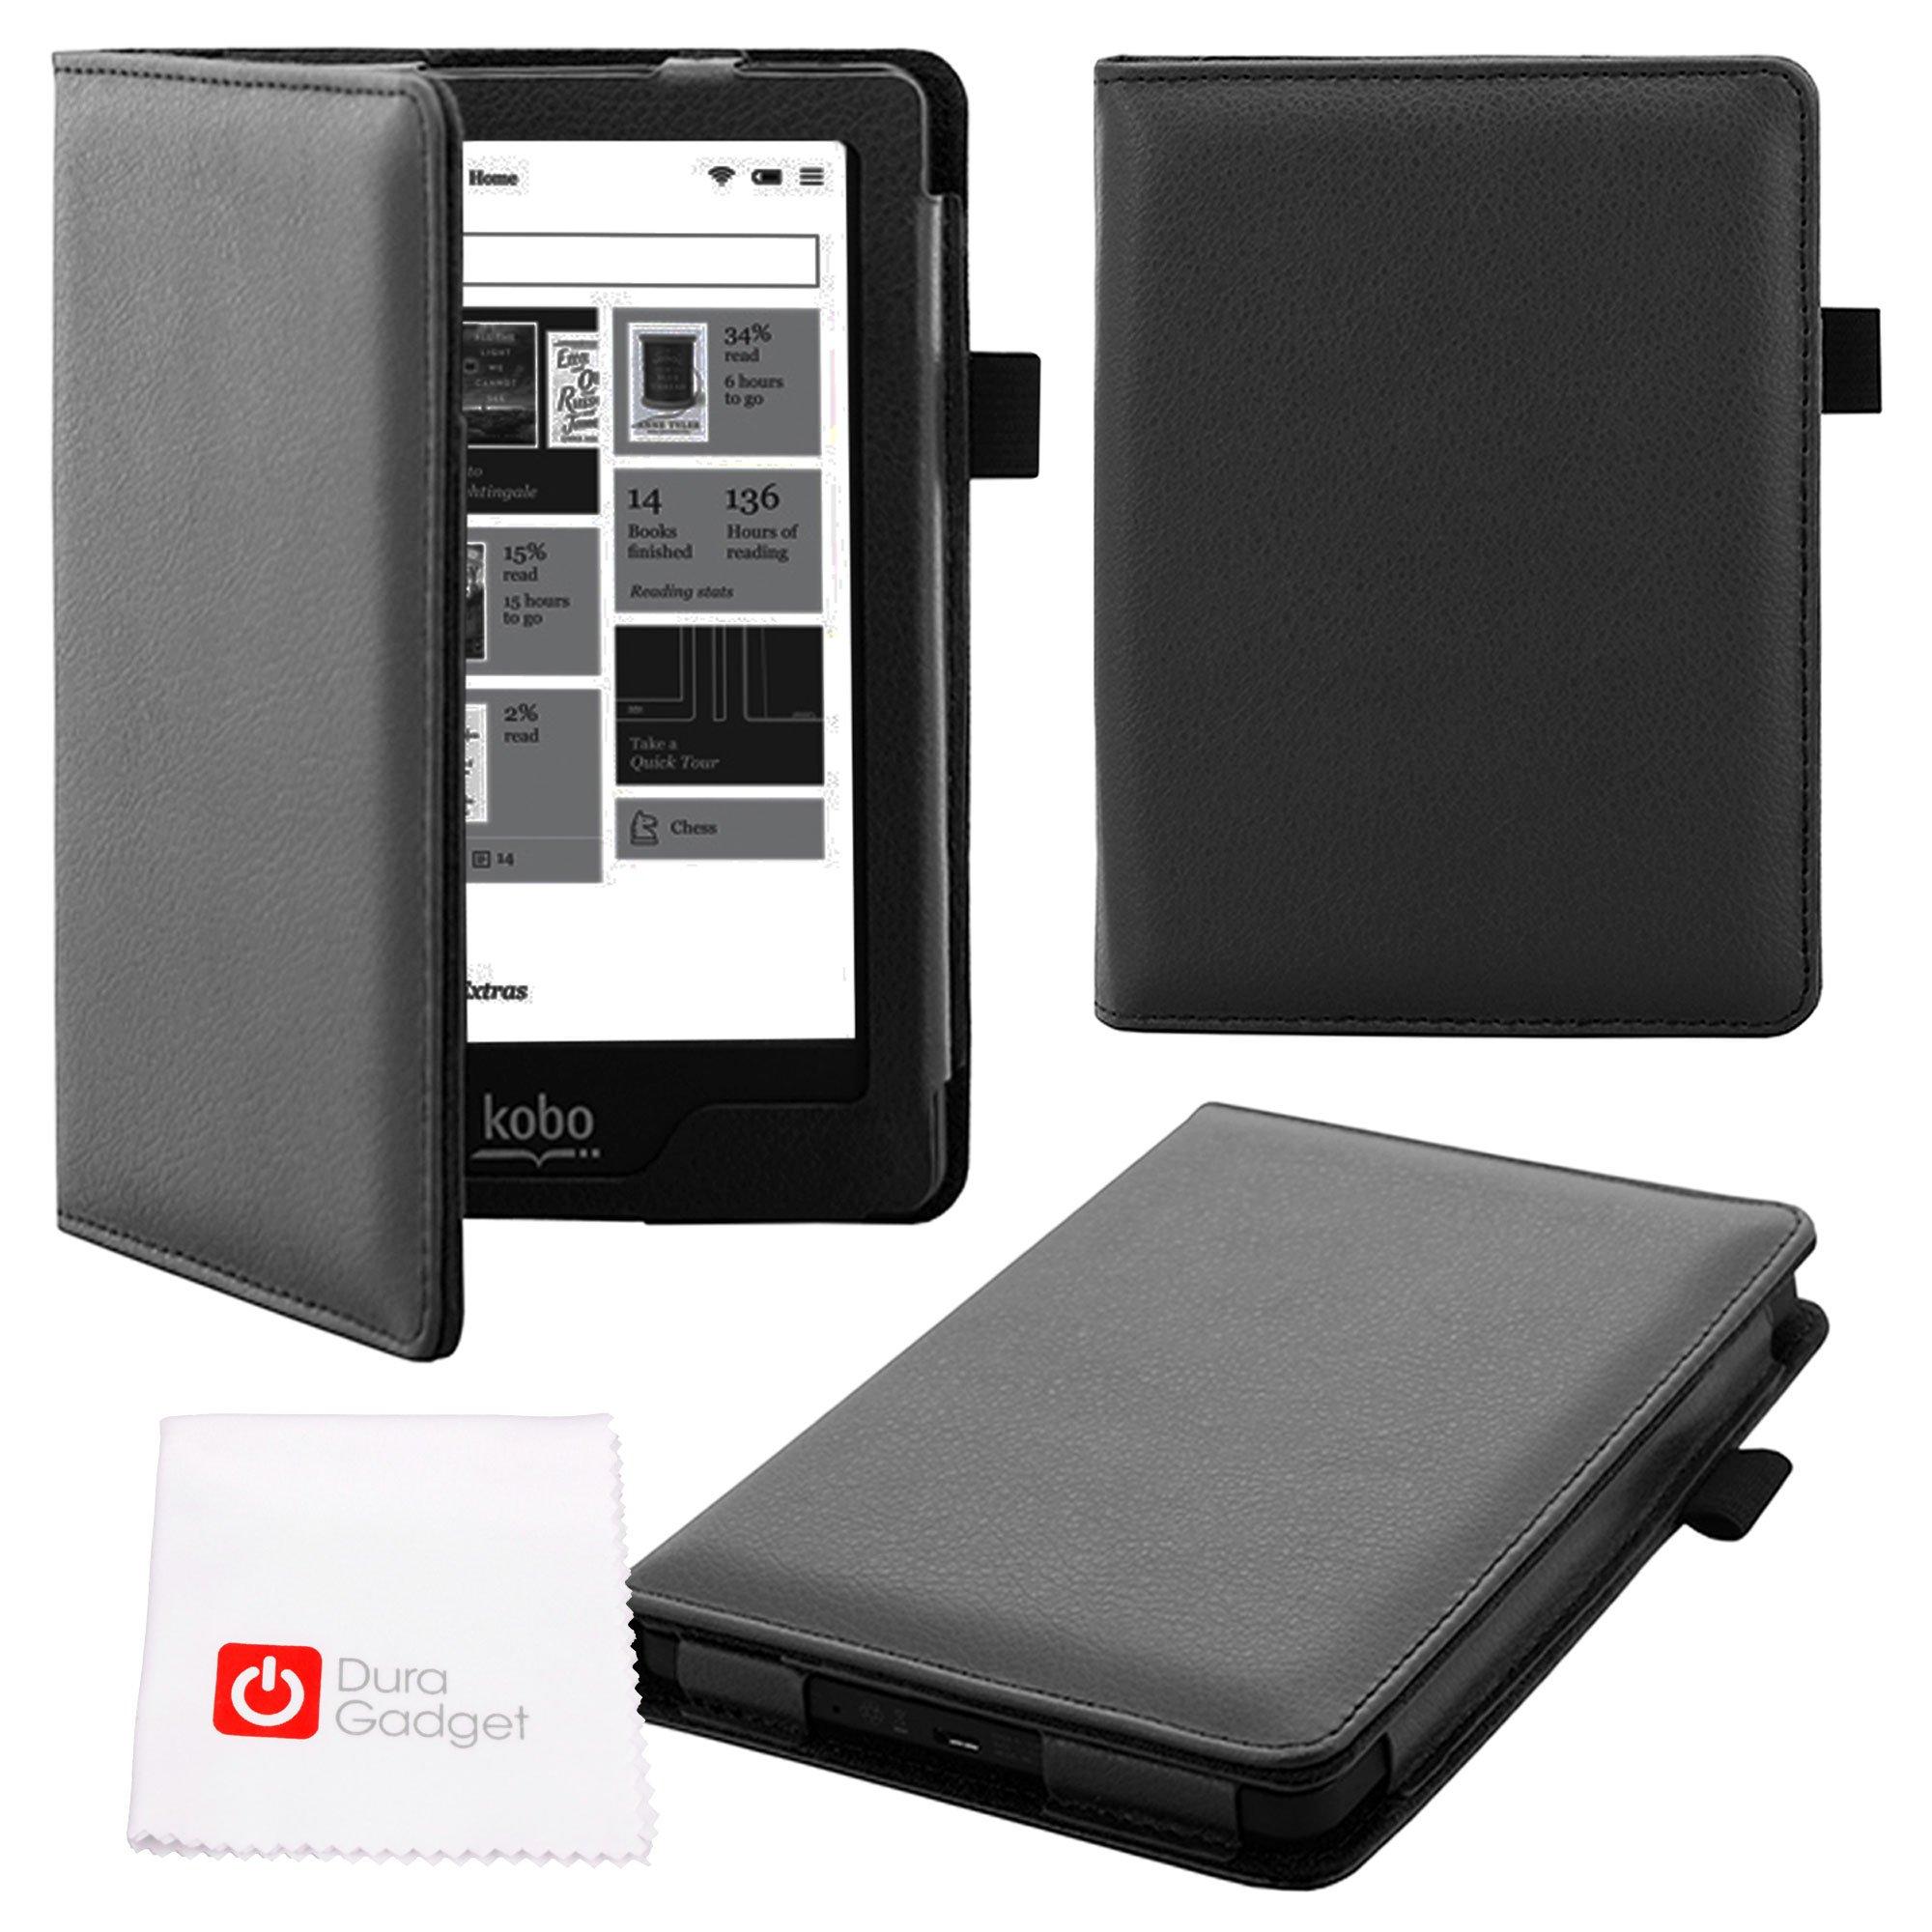 DURAGADGET Deluxe Kobo Glo HD Custom eReader Case - Sleek Magnetic 'Book-Style' Faux Leather Custom Case / Cover in Black Designed for NEW 2015 Kobo Glo HD, Kobo Glo, Kobo Touch 2.0 & Kobo N613-KBO-B eReader GLO Edition